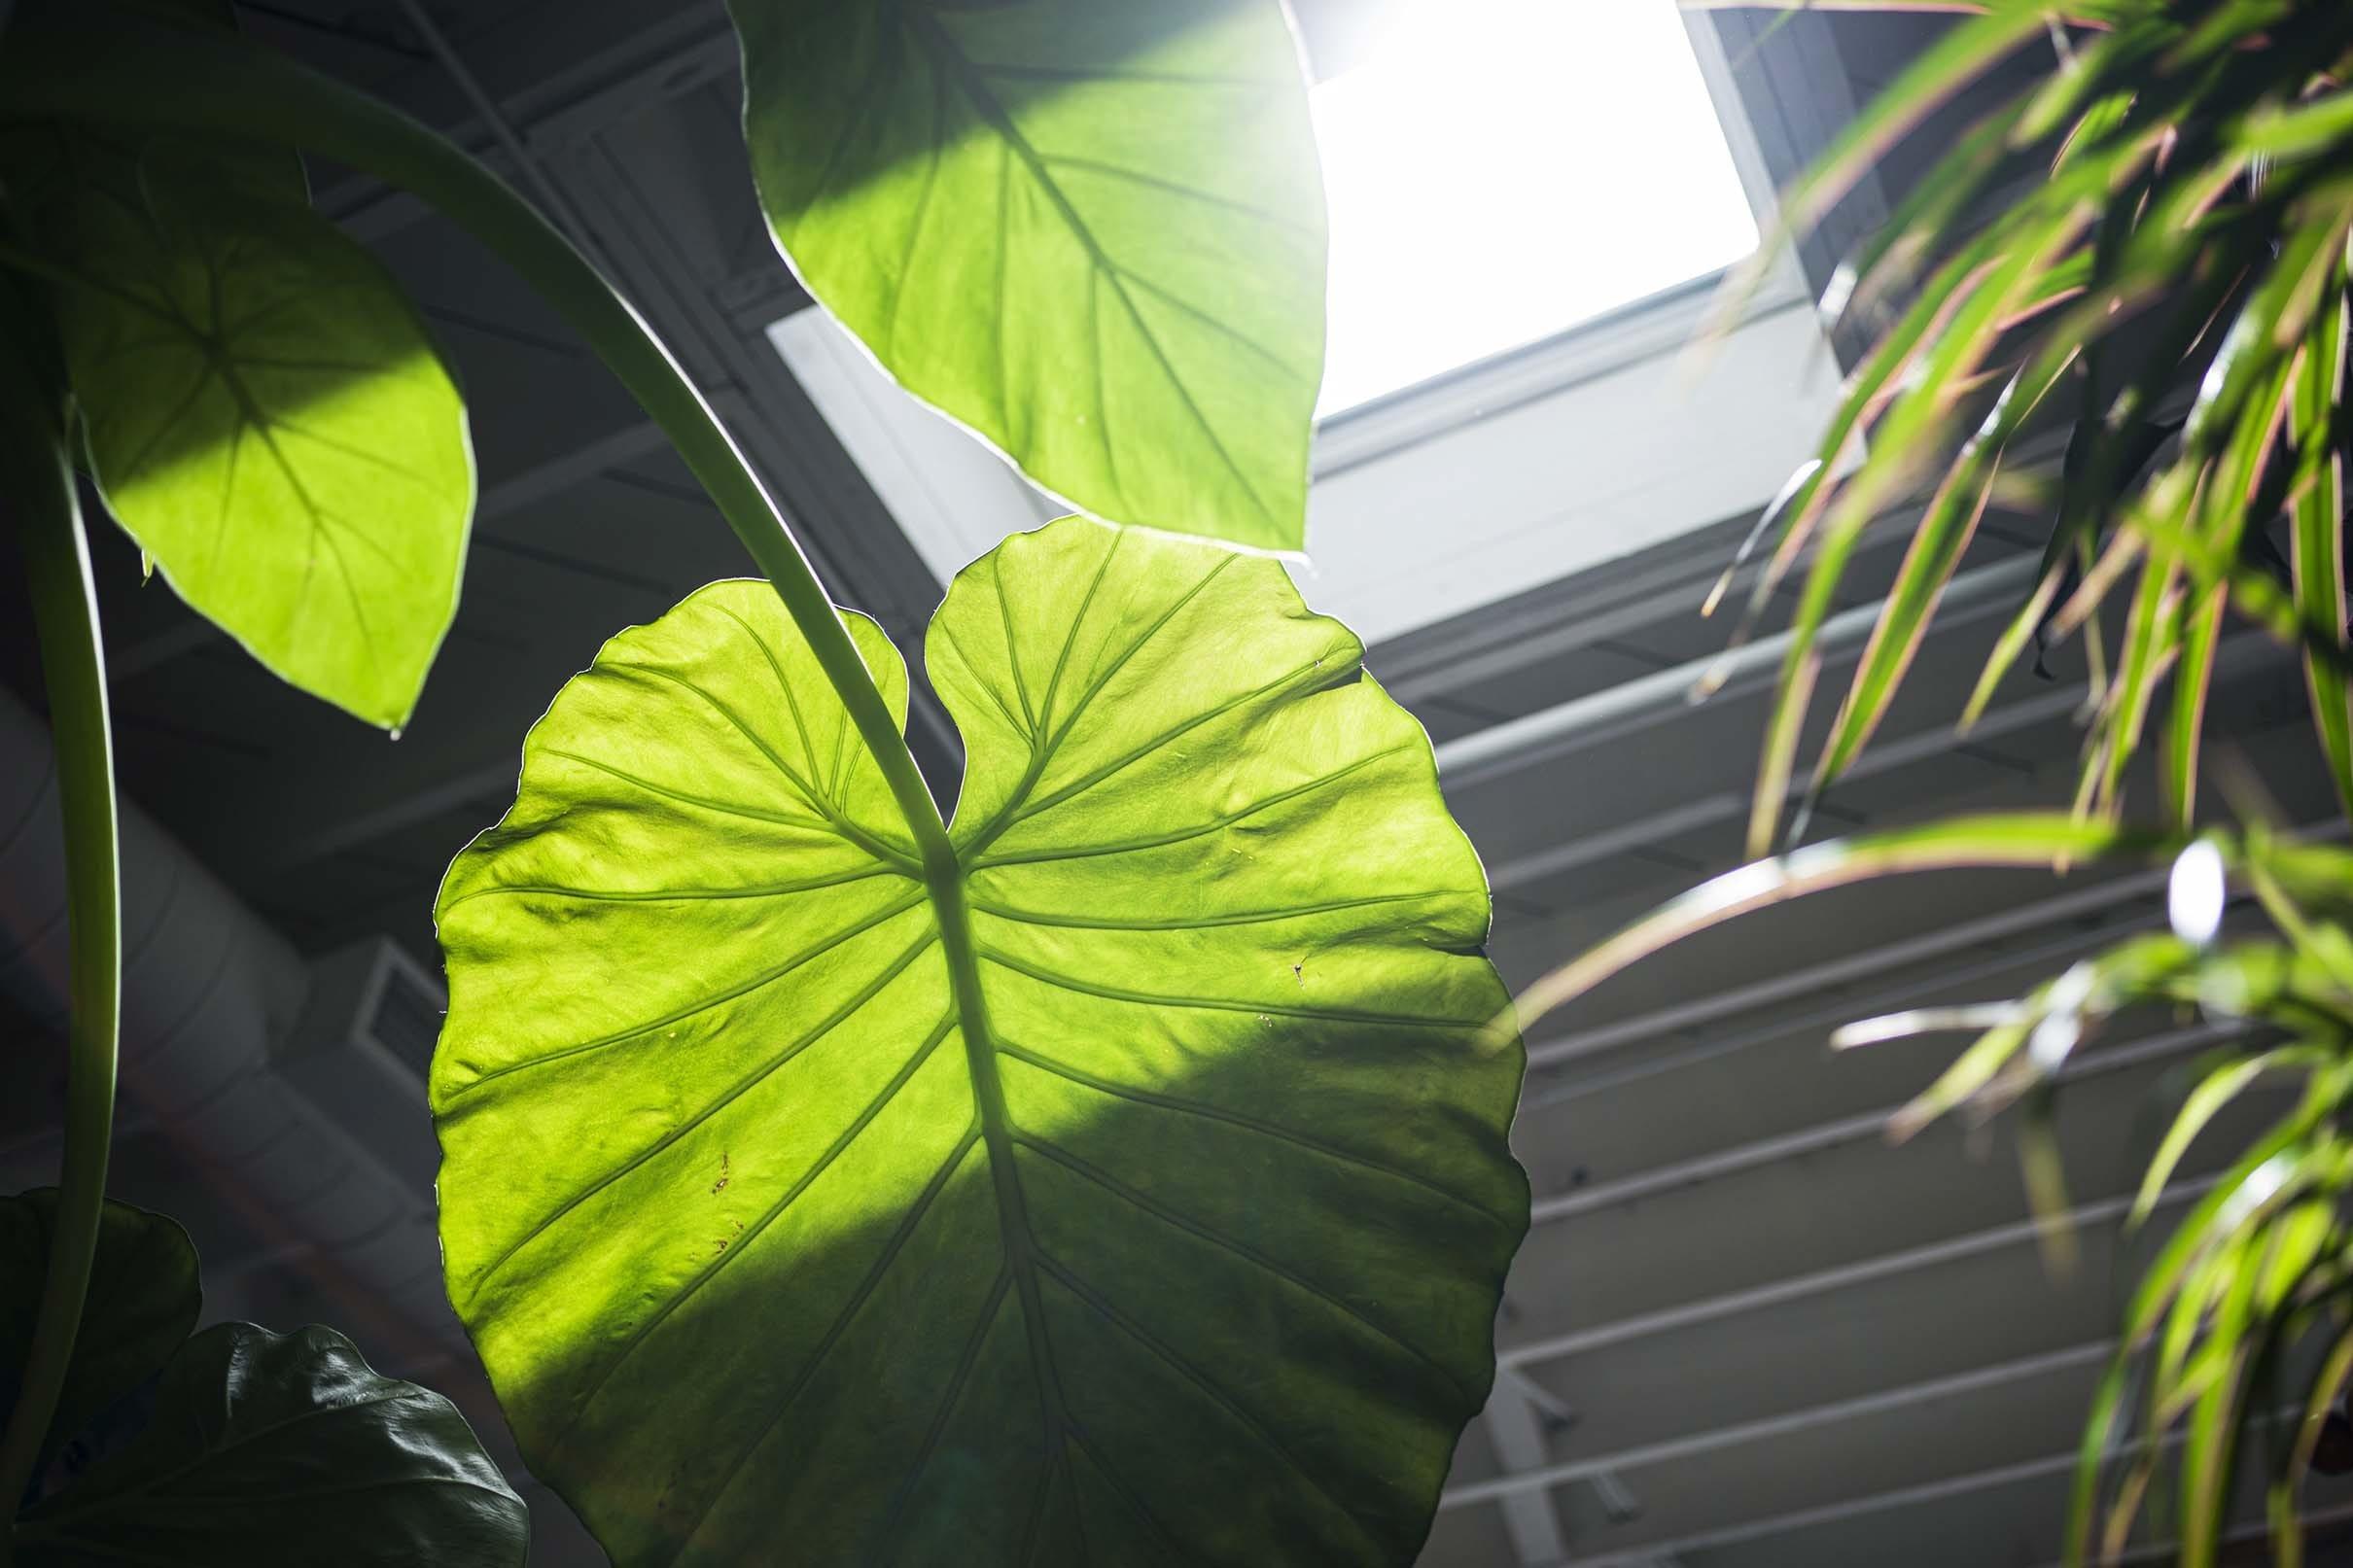 Skylight plant leaf sunlight small